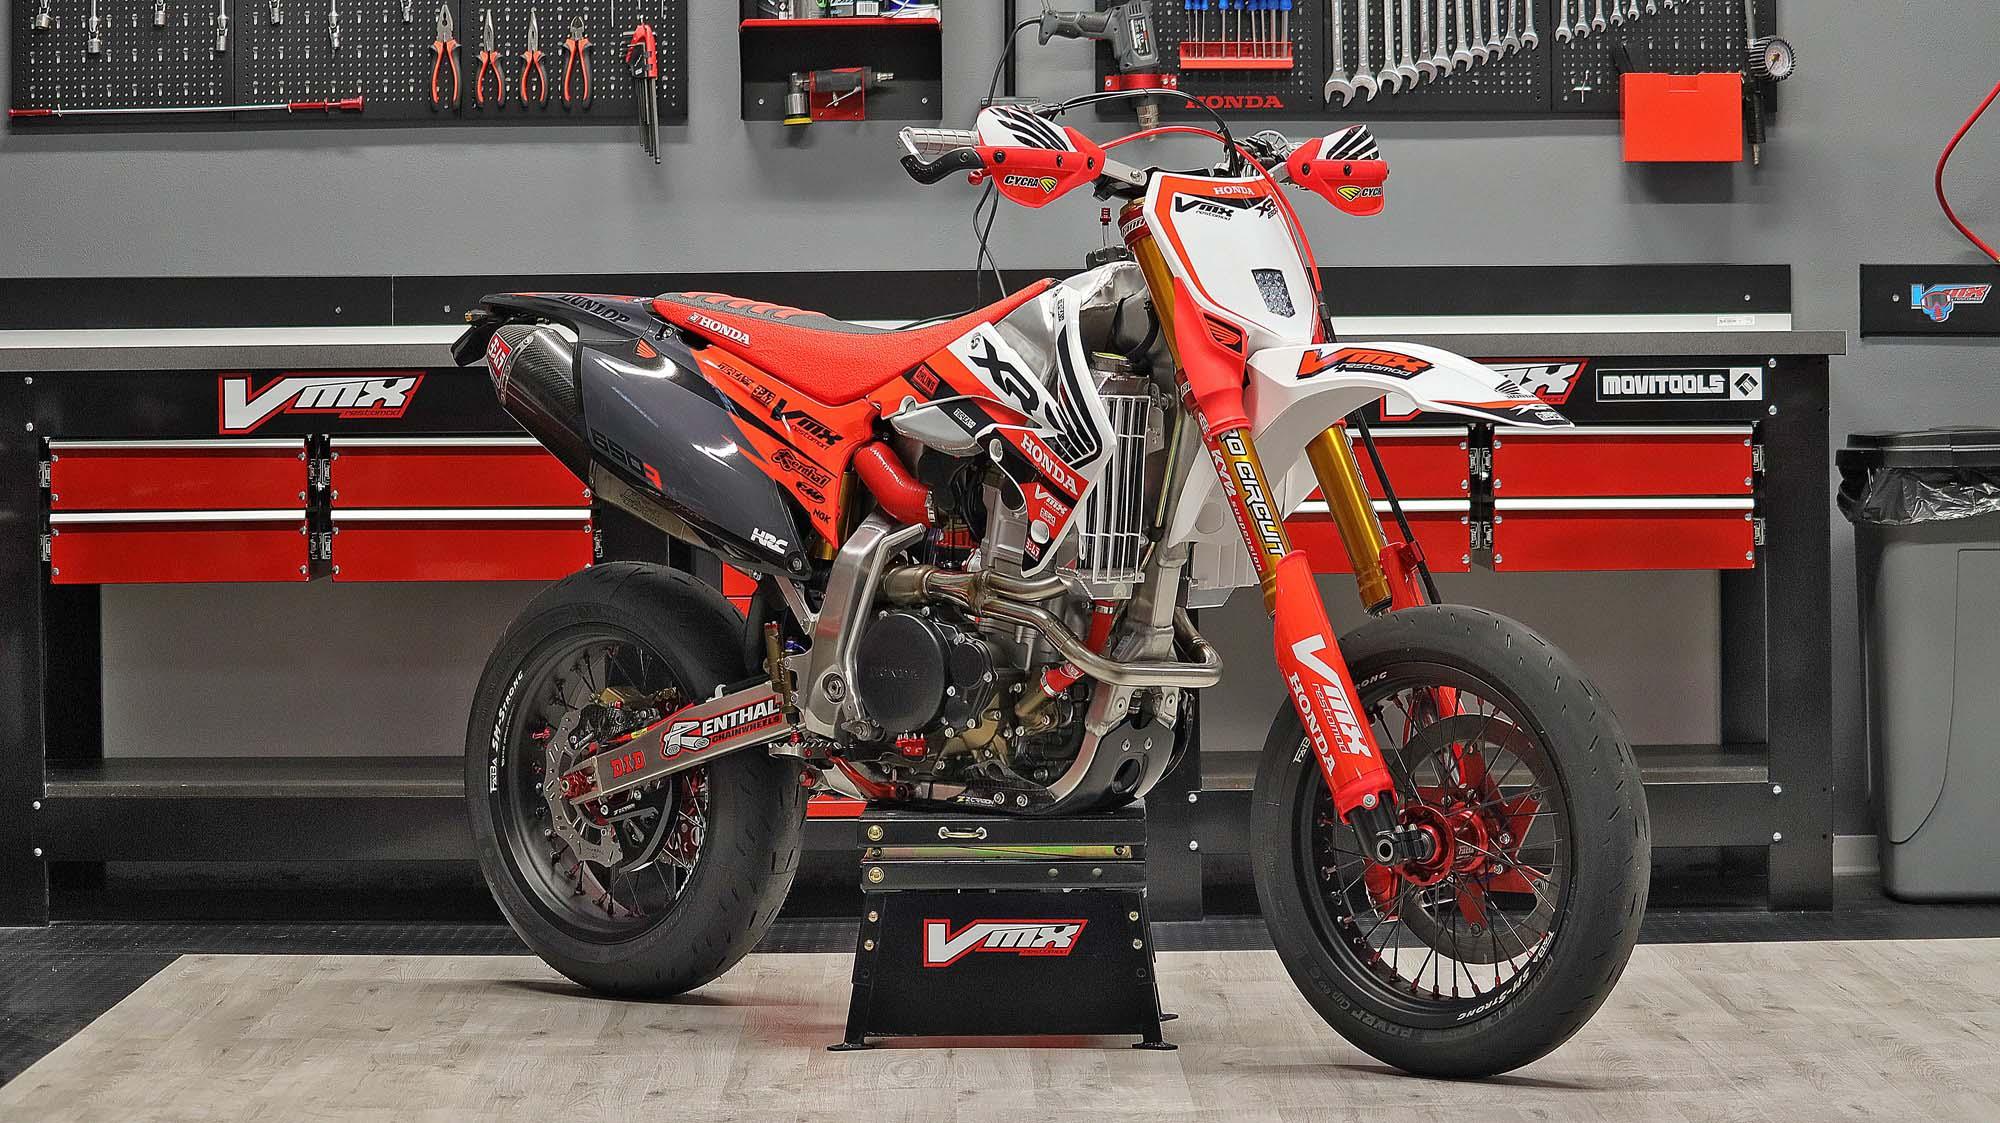 Honda Xr650r Top Speed